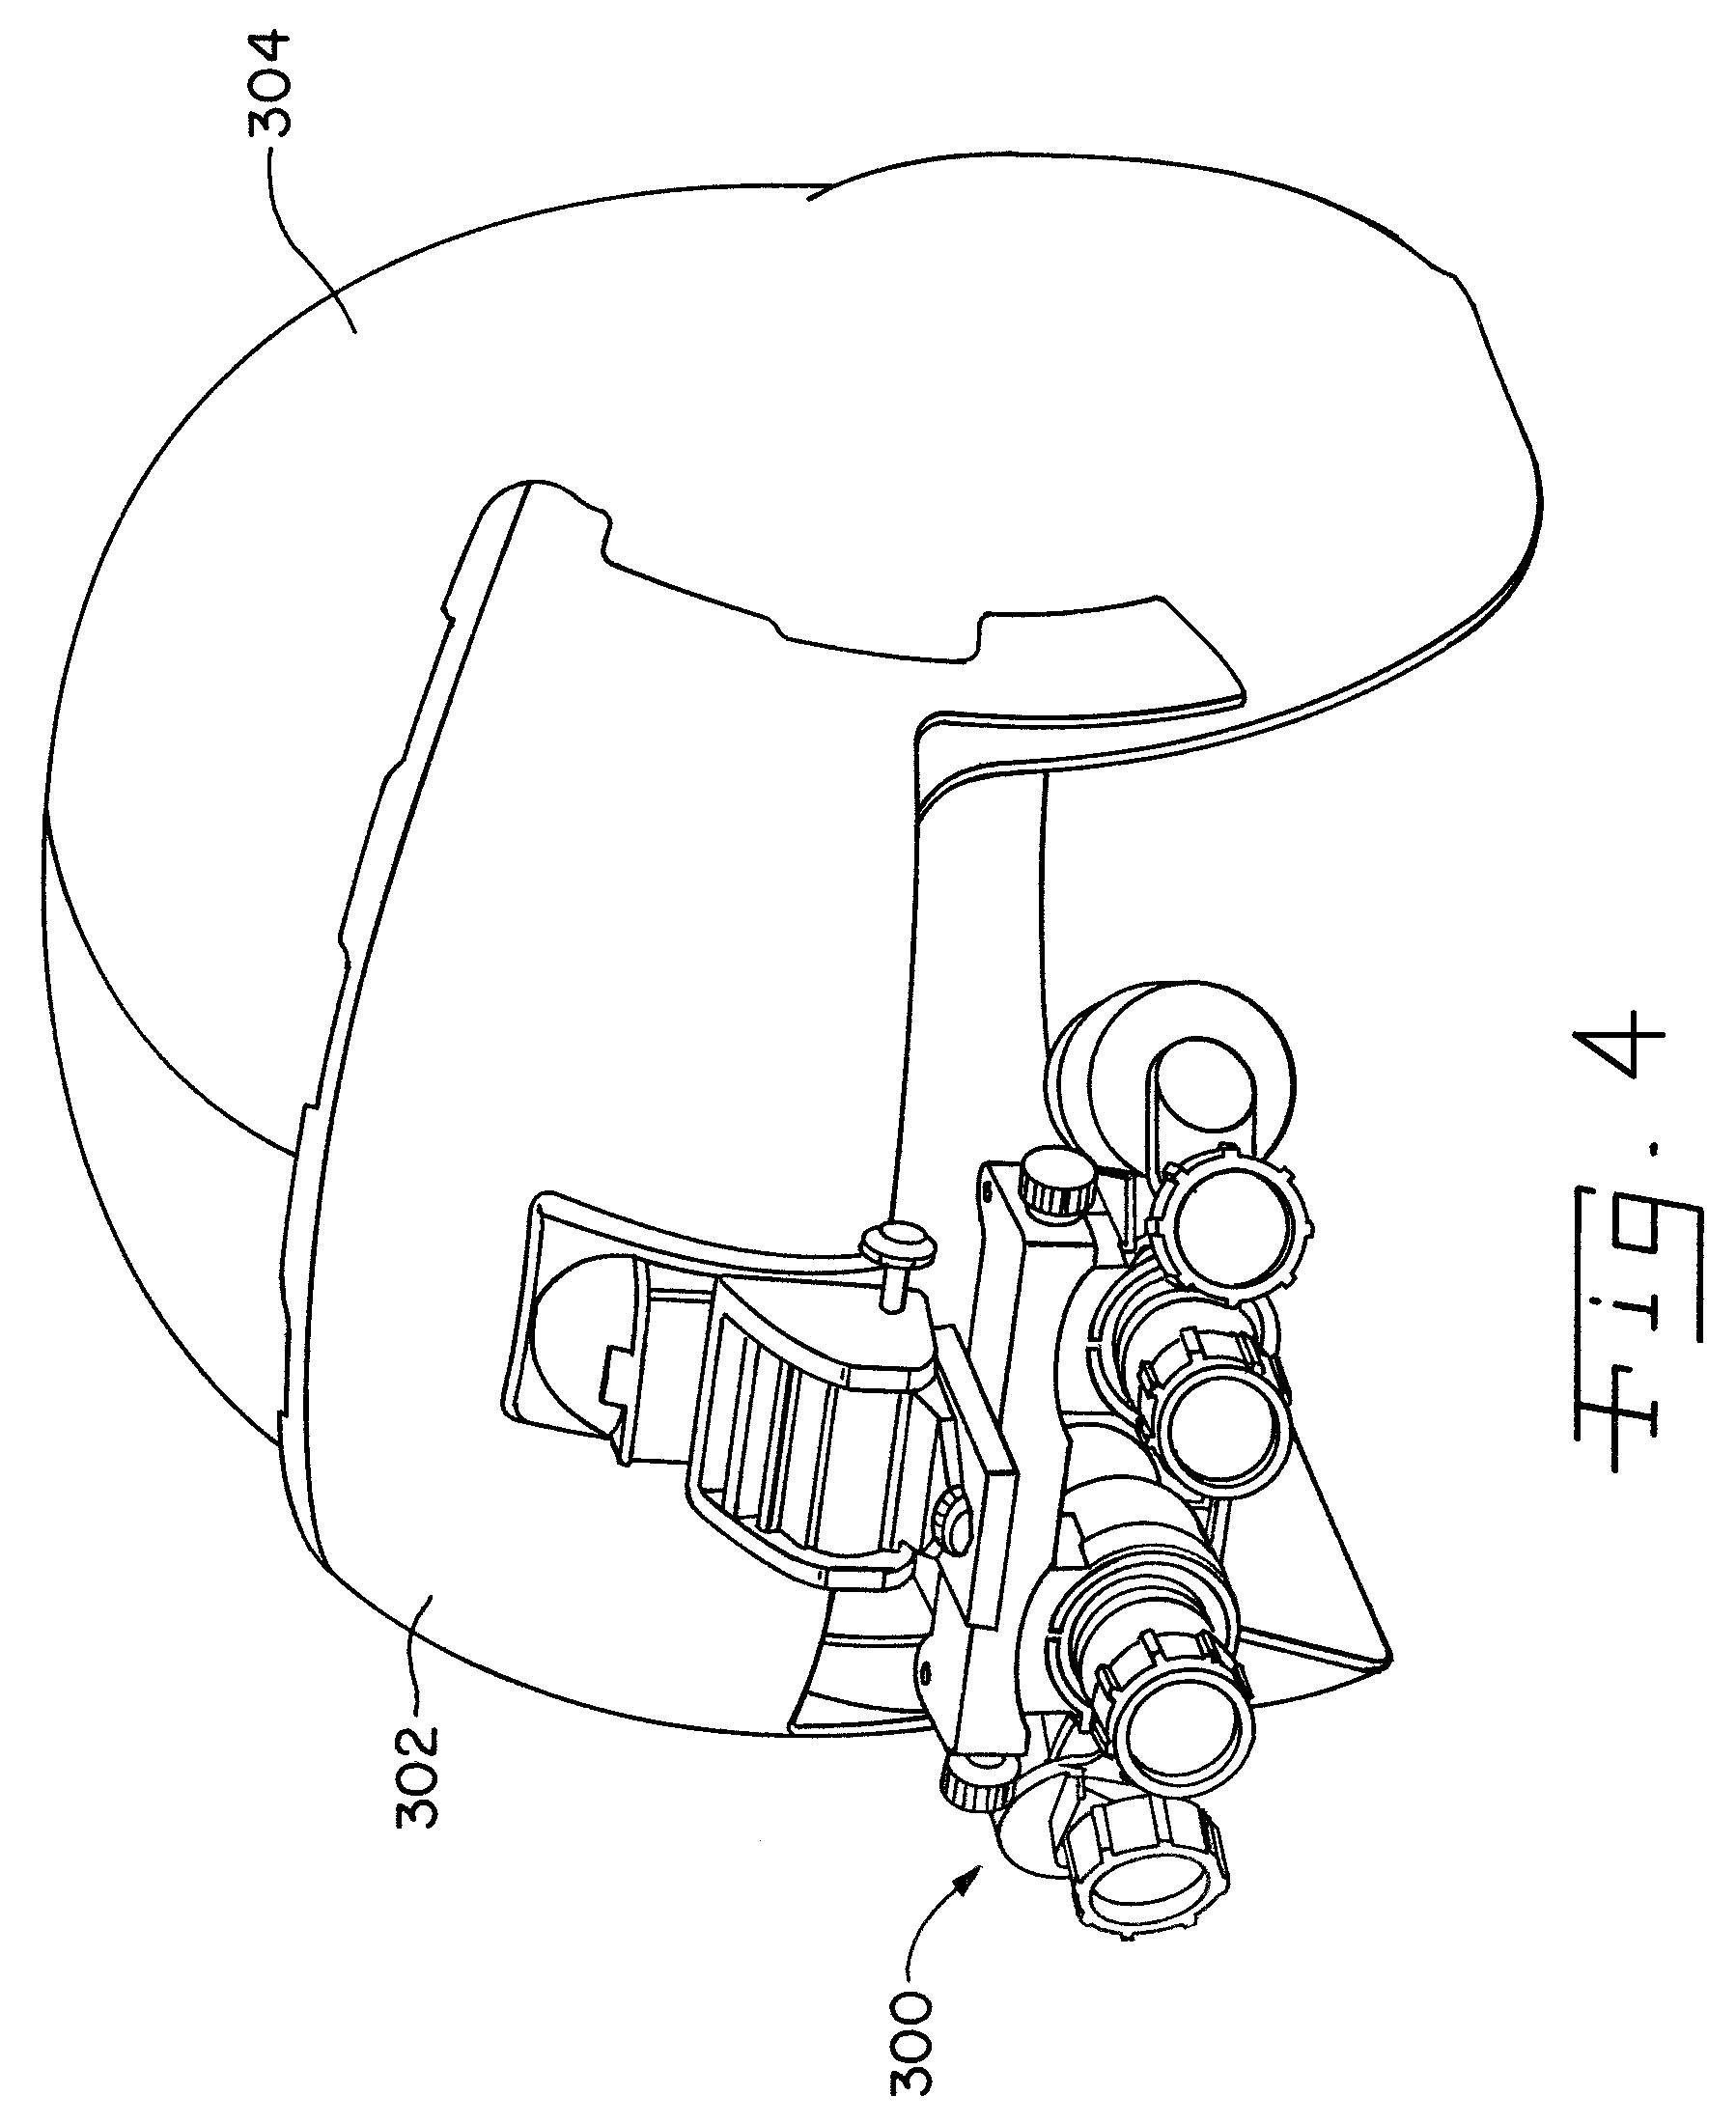 Lt80 Carb Diagram Electrical Wiring Diagrams Suzuki 230 Quadrunner Quad And Schematics 150cc Scooter Charming 160